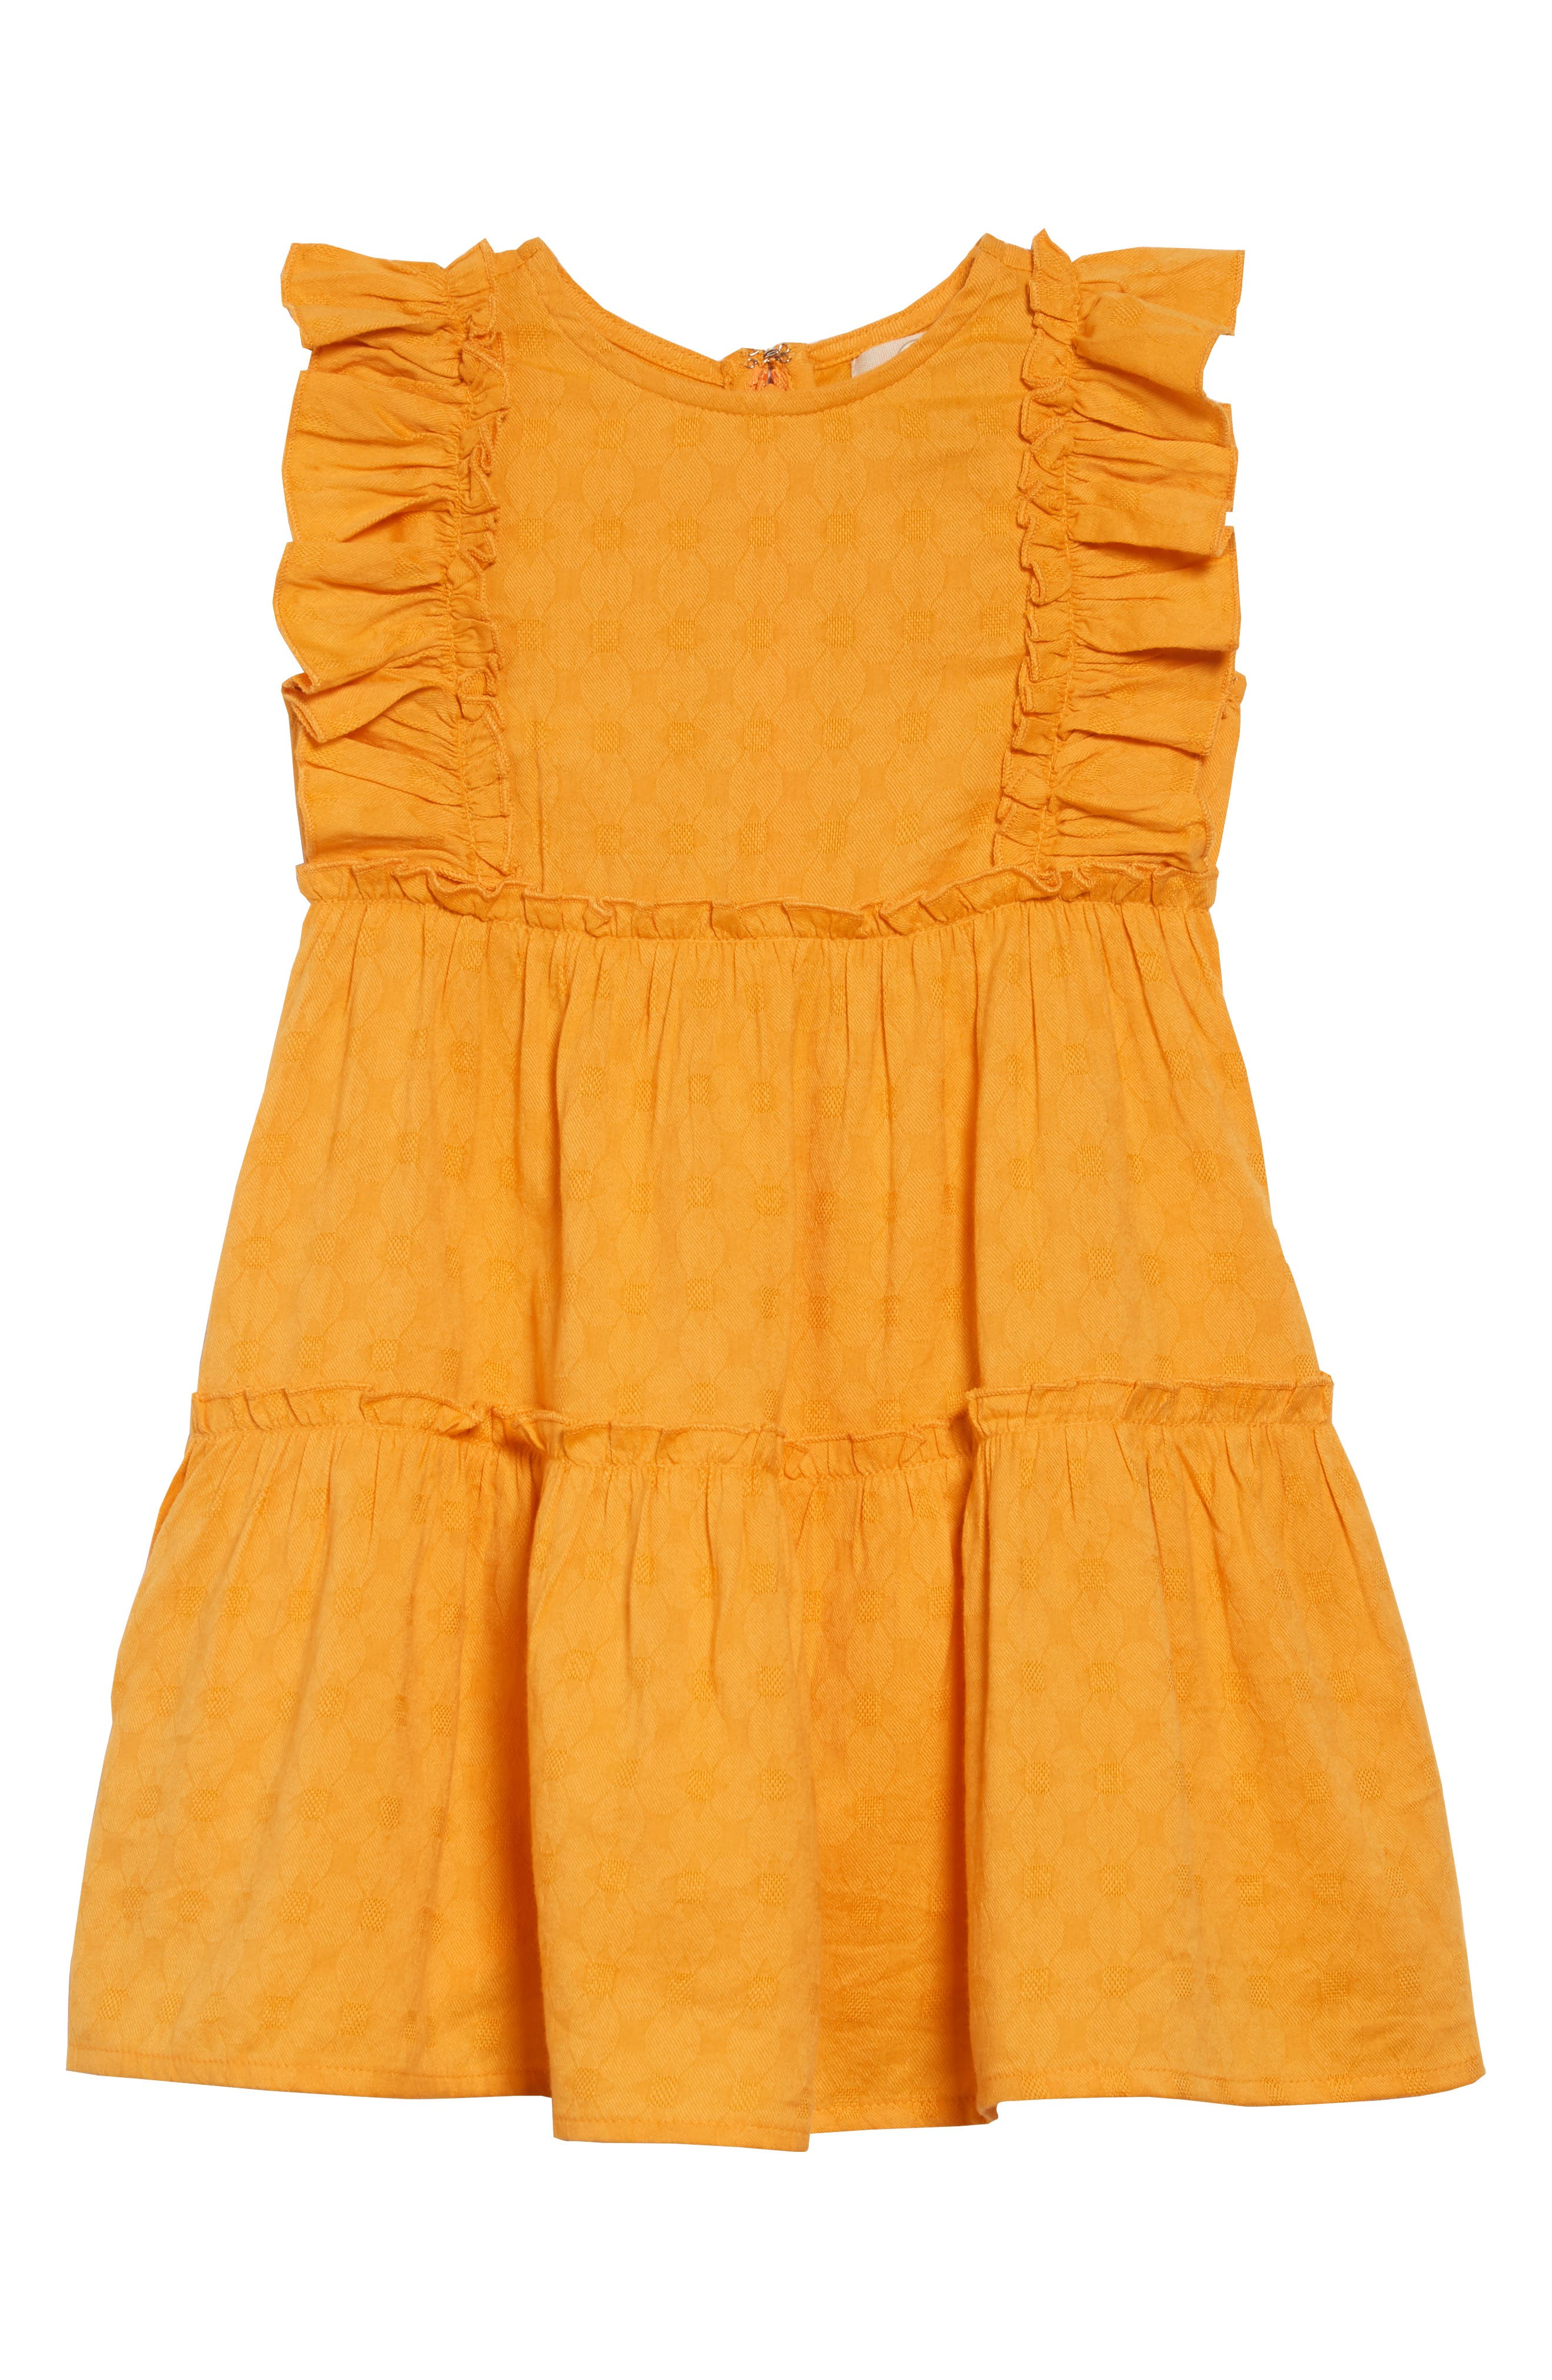 PEEK AREN'T YOU CURIOUS, Angelica Ruffle Dress, Main thumbnail 1, color, 700